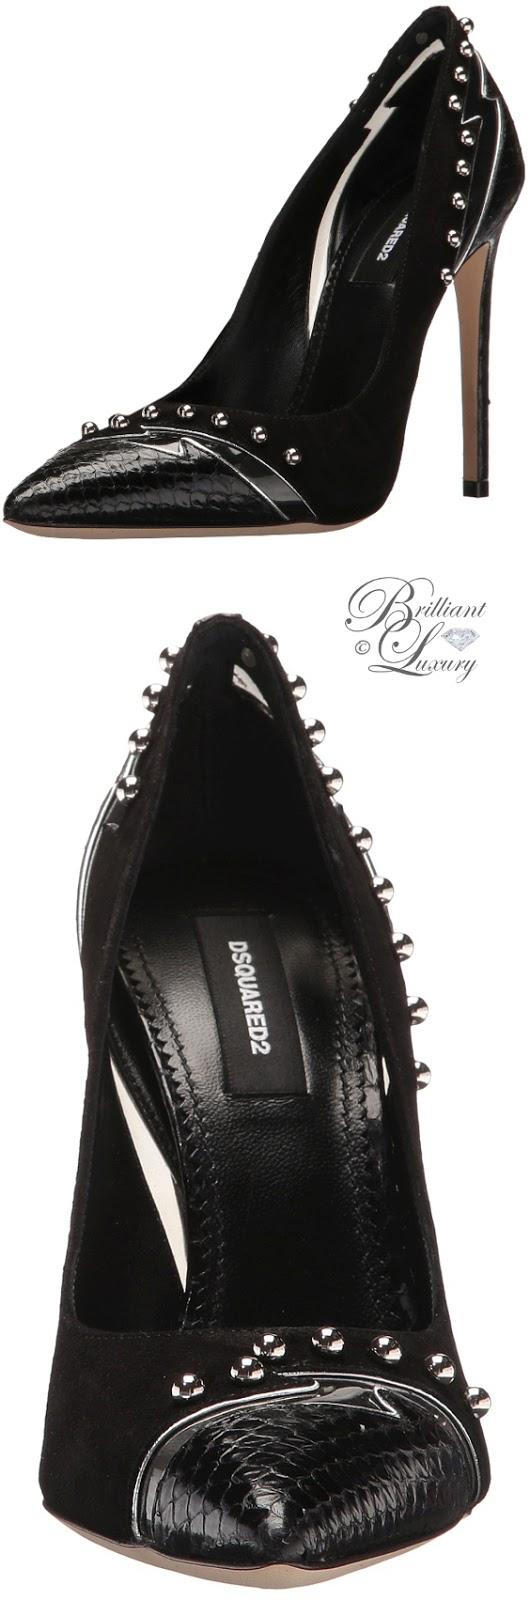 Brilliant Luxury ♦ Dsquared2 black pumps